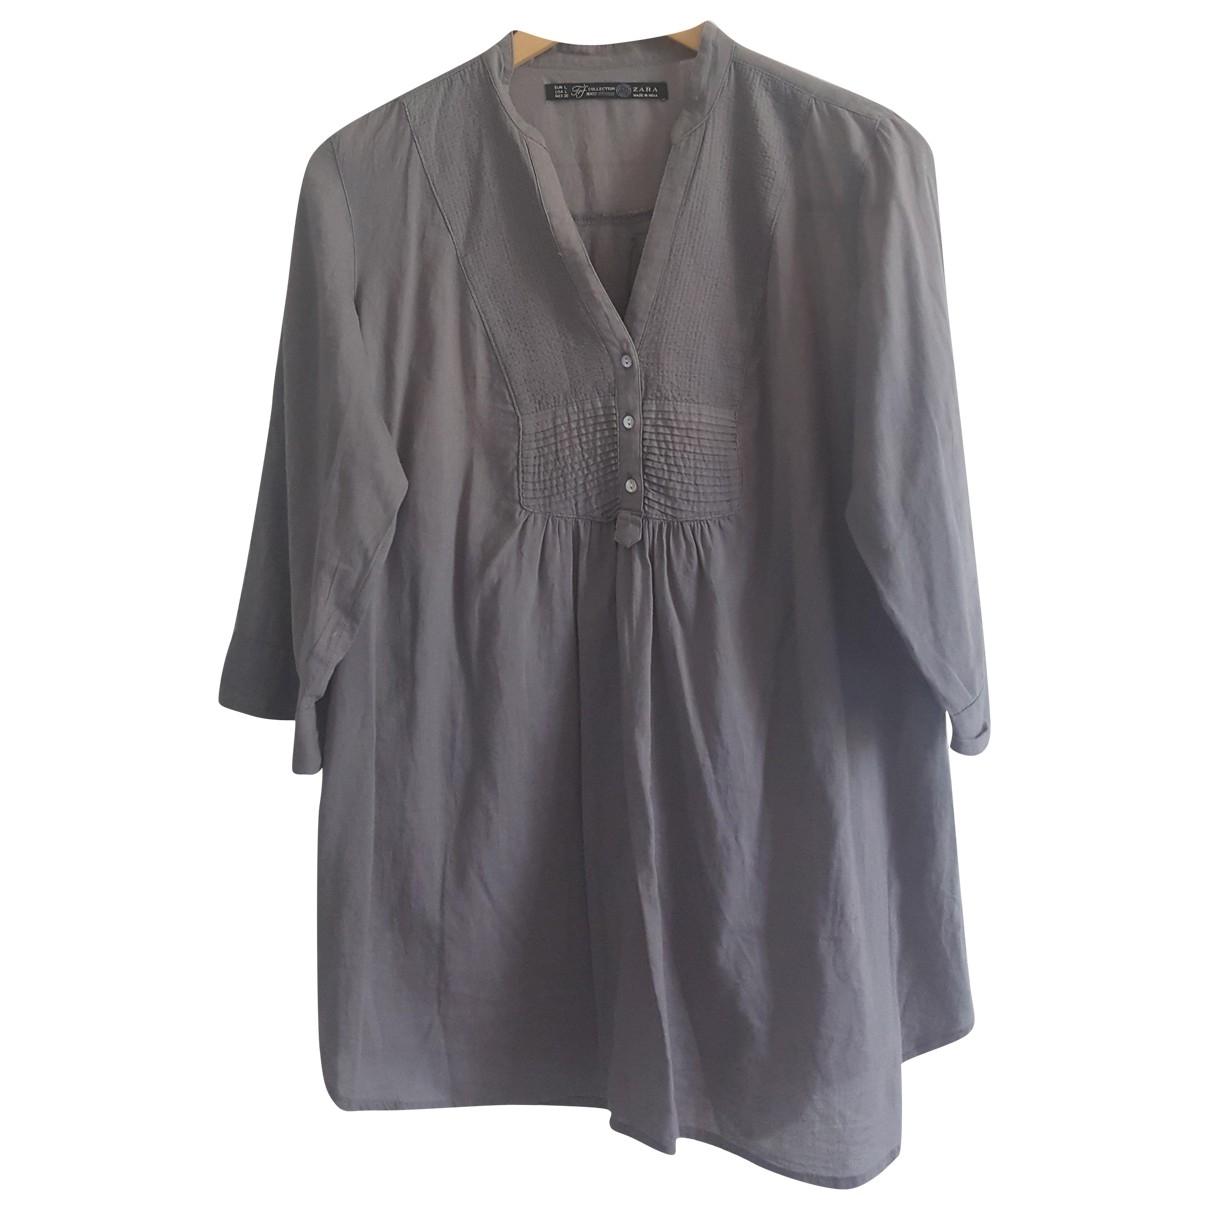 Zara \N Grey Cotton  top for Women L International